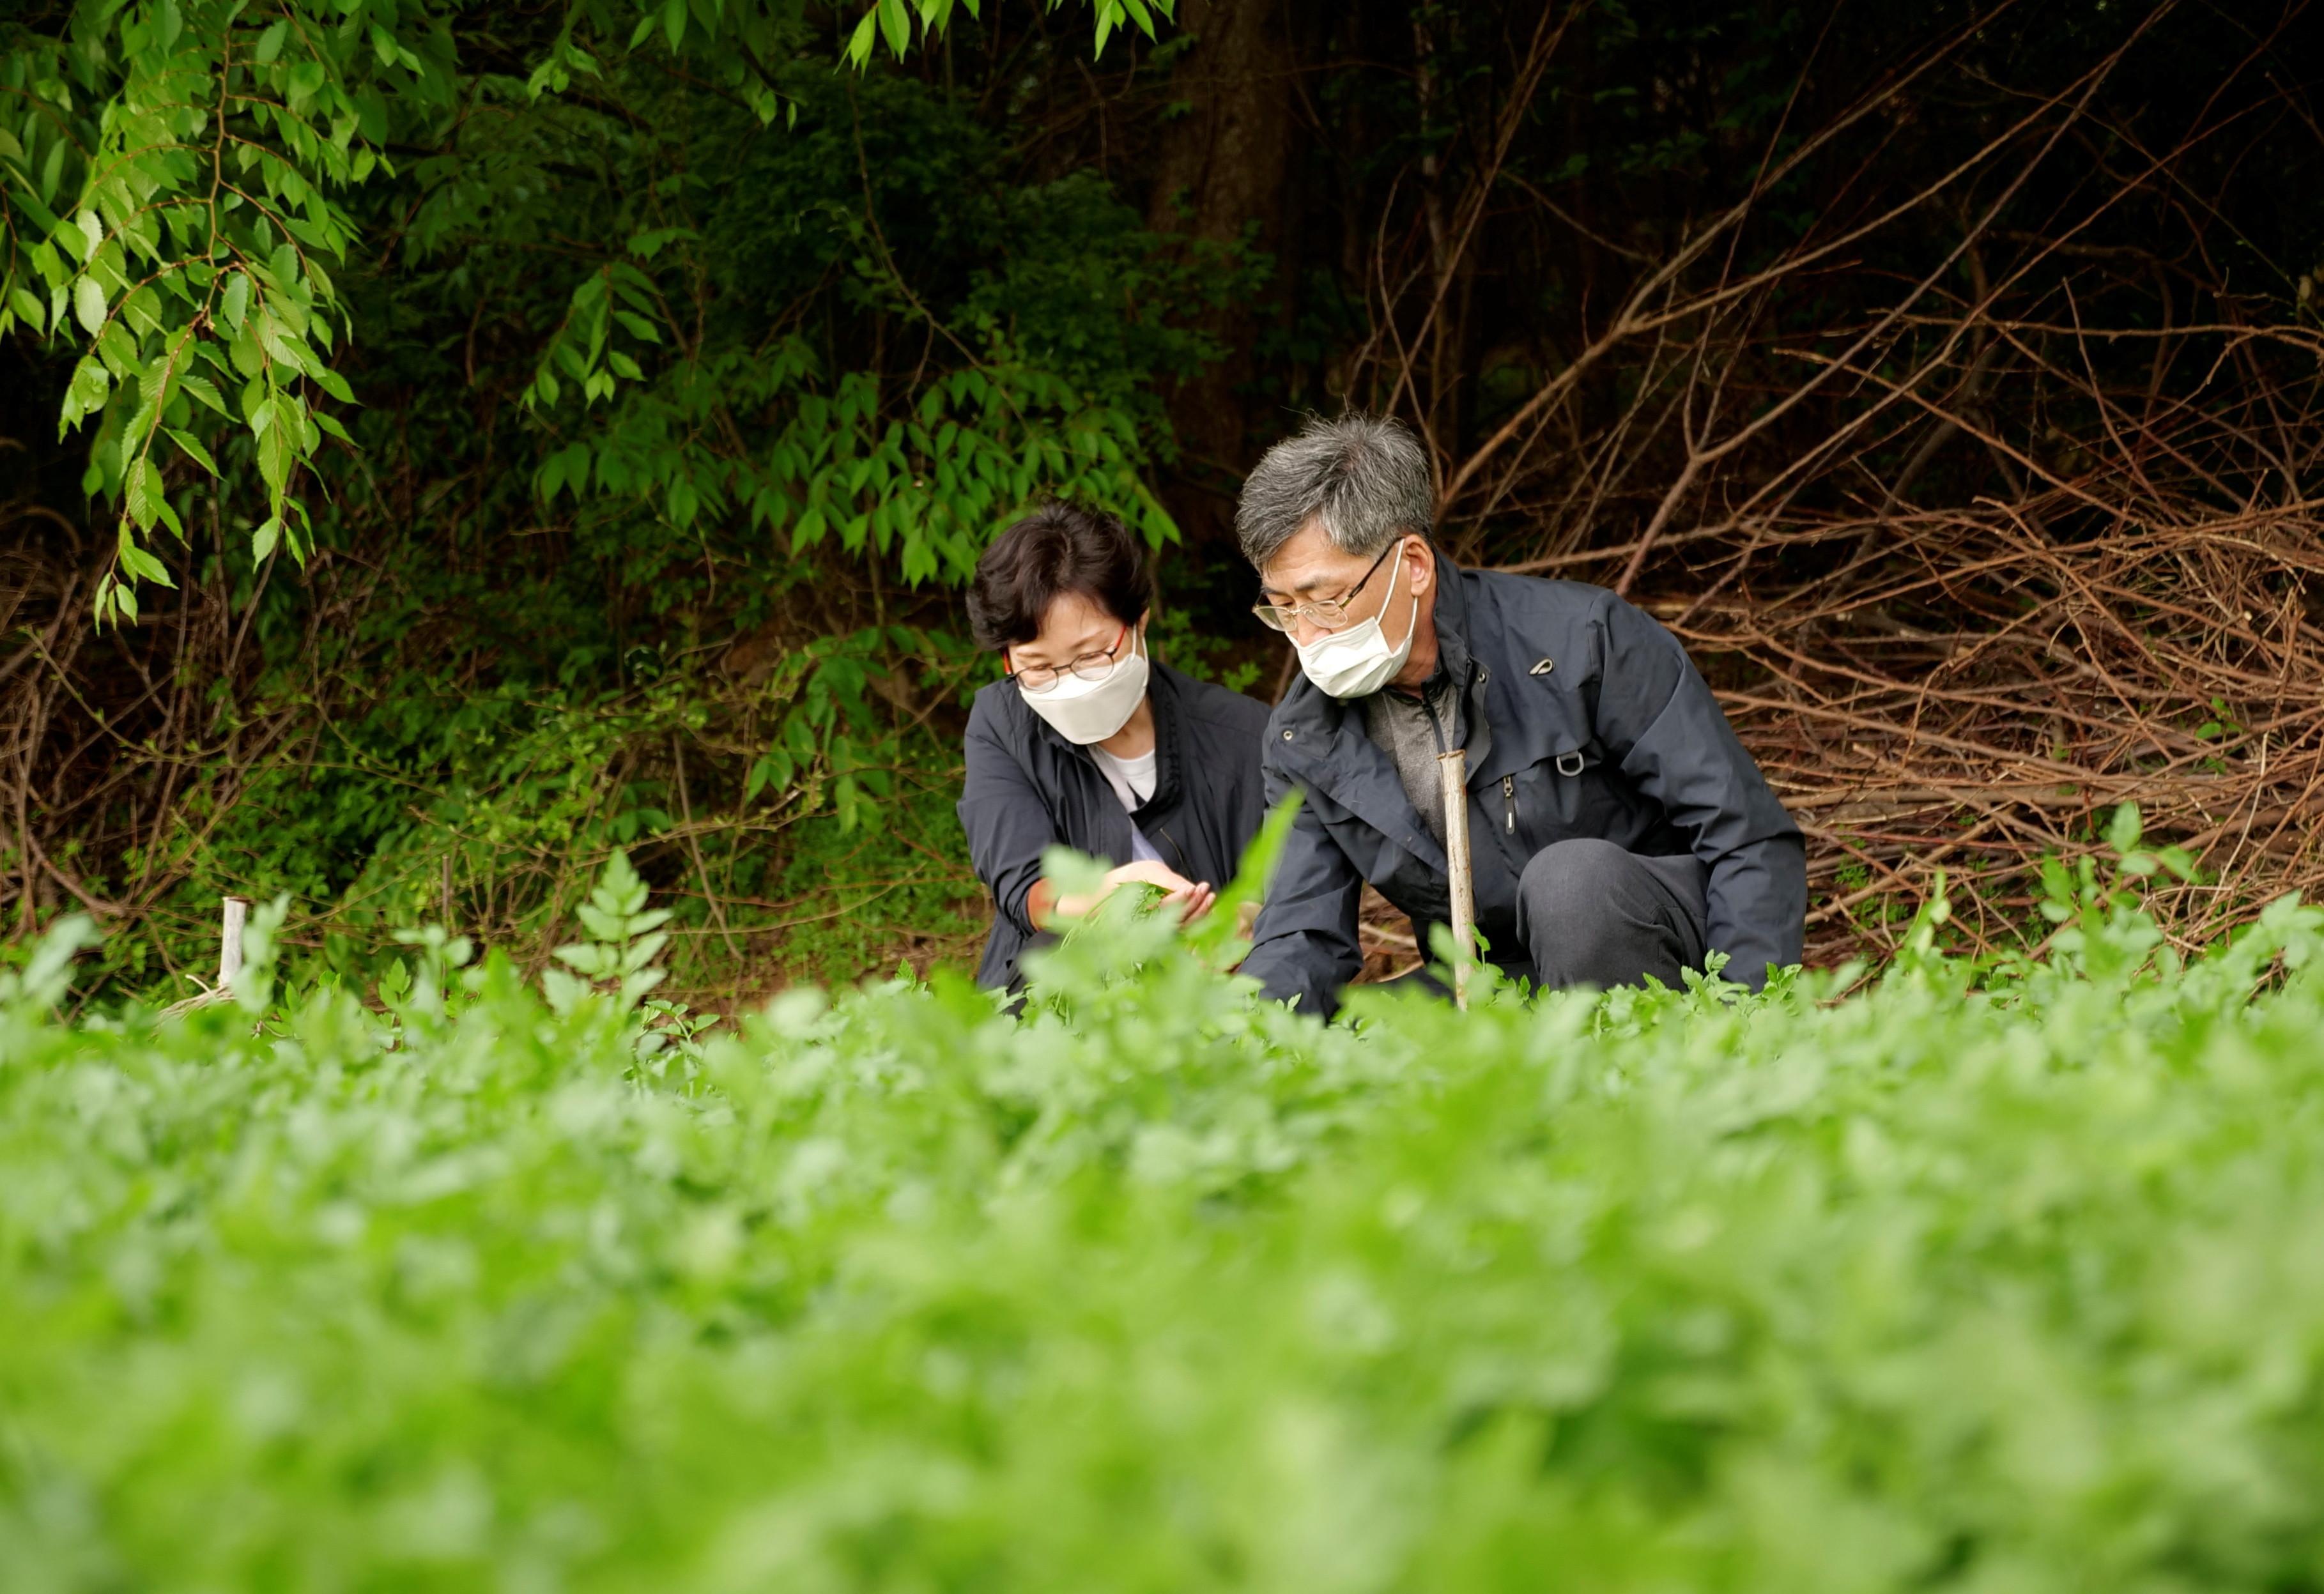 A farmer Ham Byoung-gab and his wife Lim Mi-seon work at their minari (water parsley) farm in Siheung, South Korea, April 26, 2021.